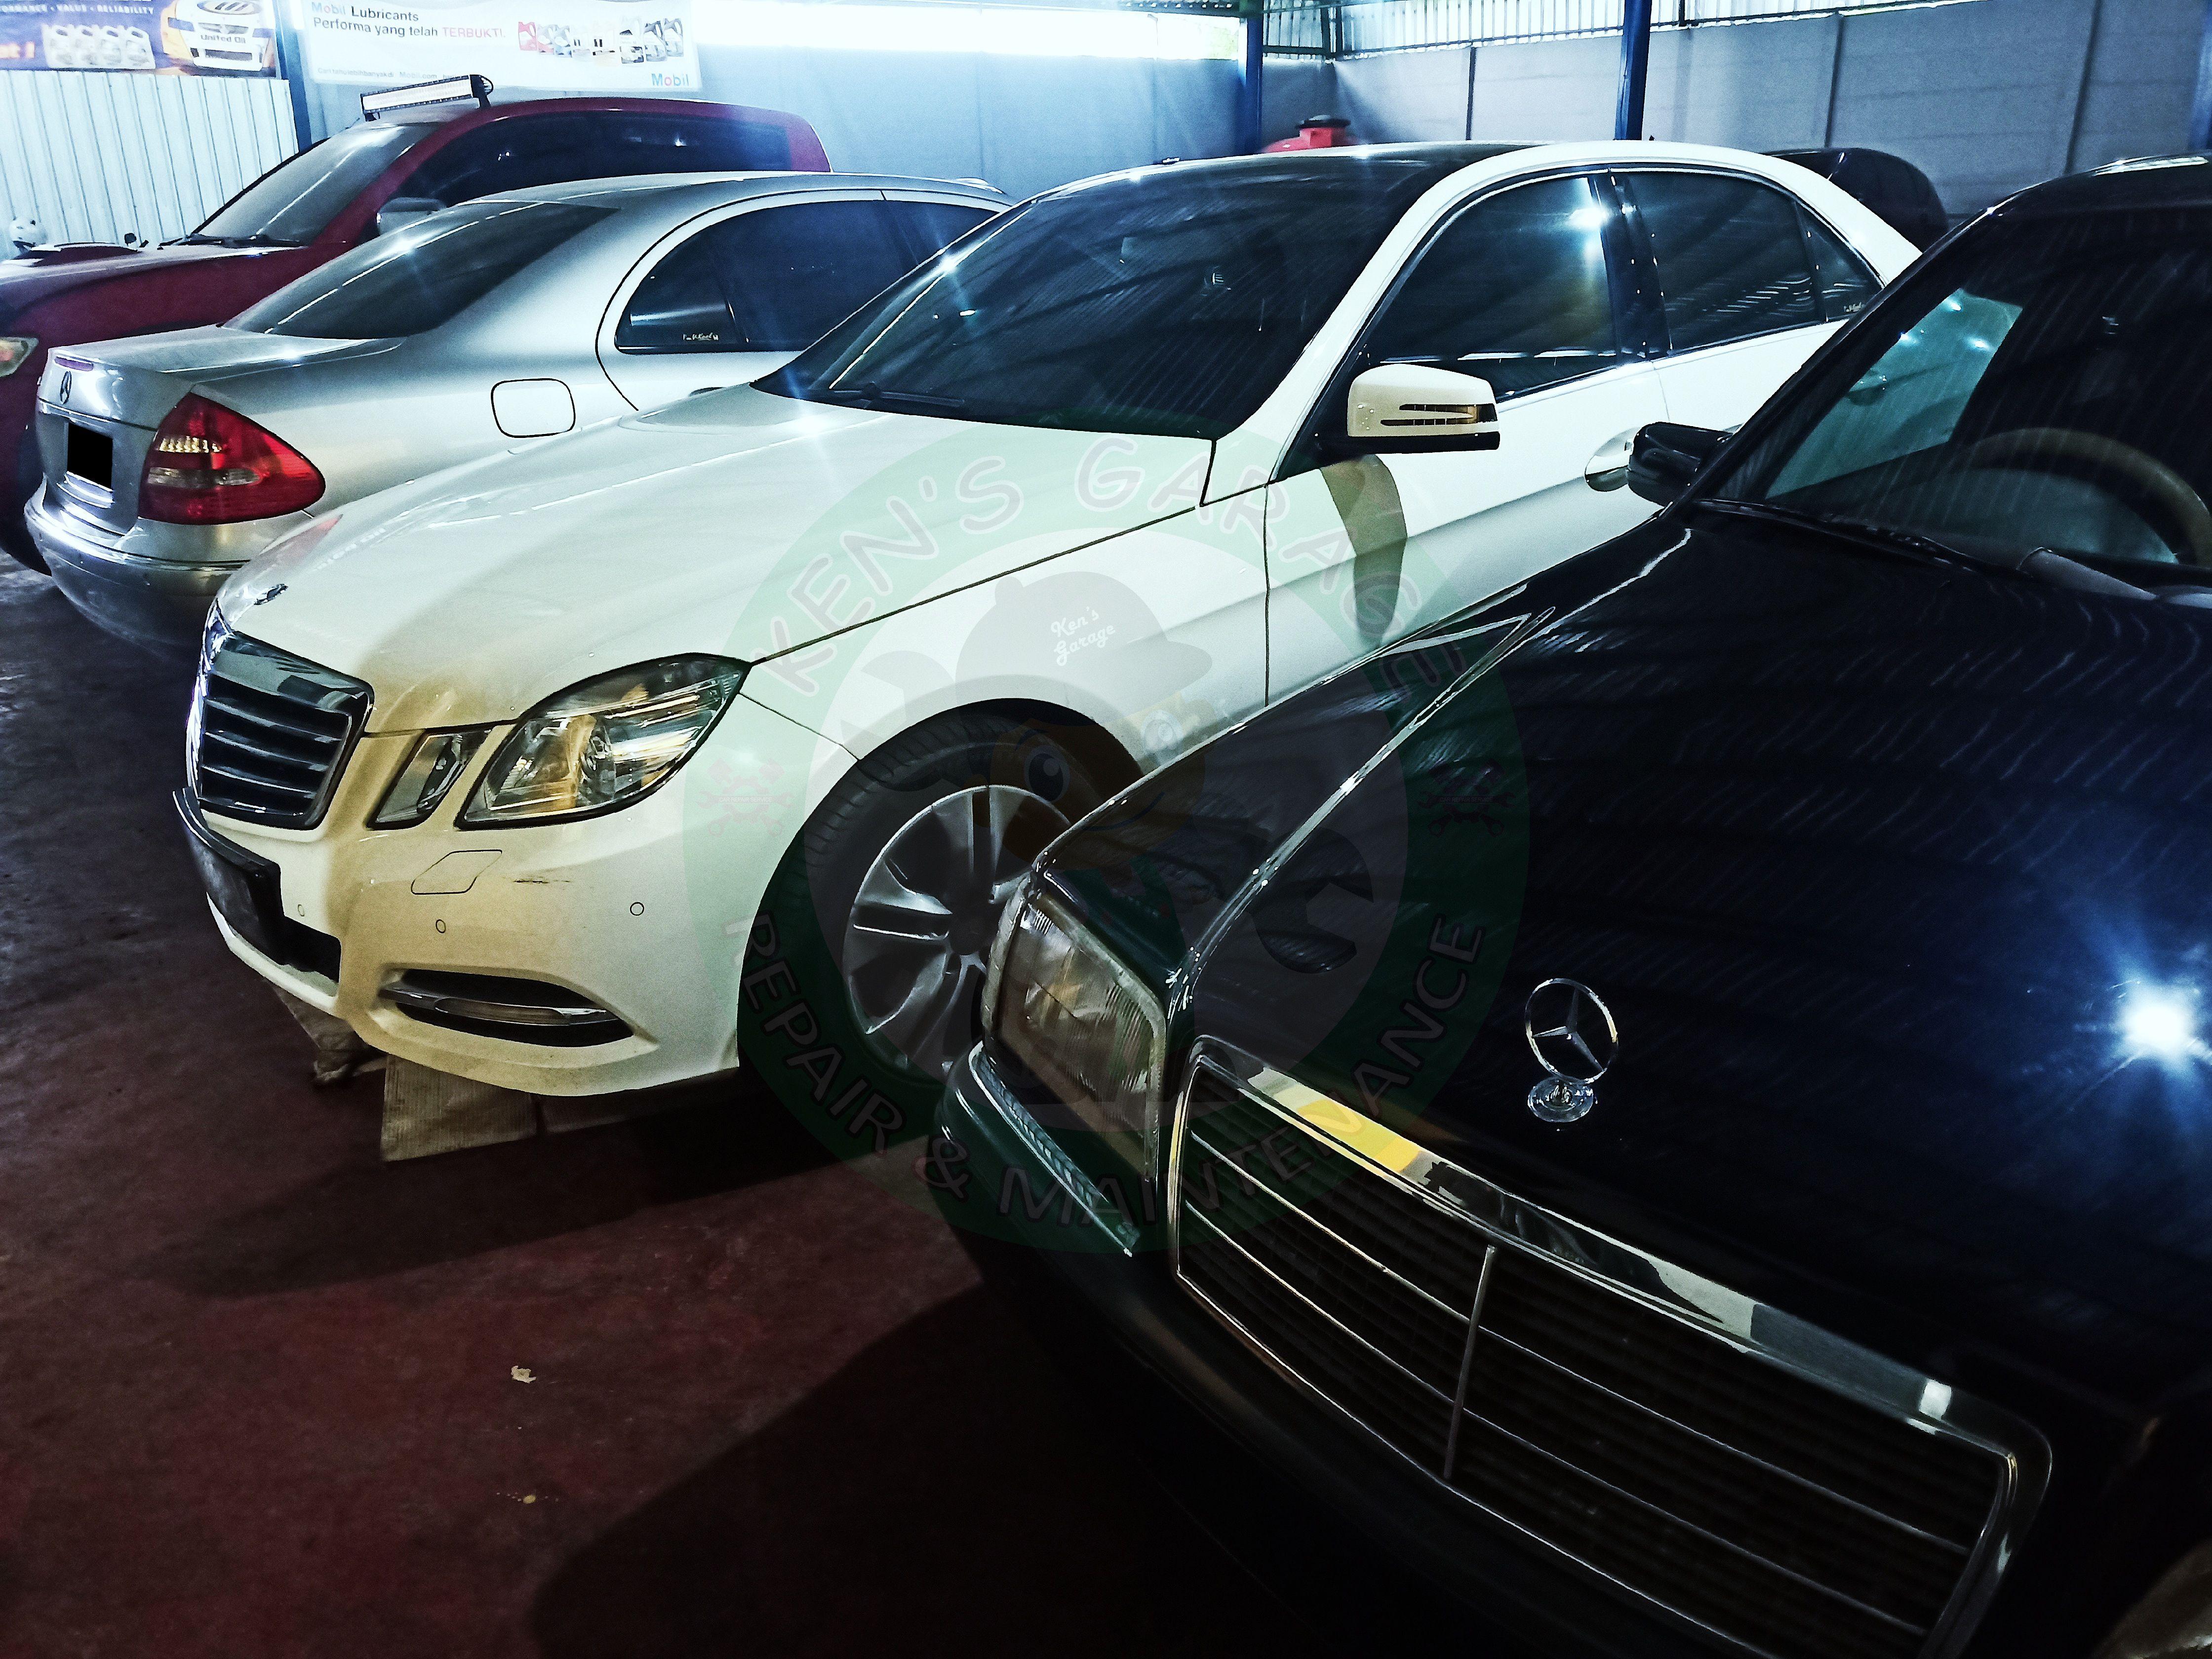 Mercedes Benz Benz Mercedes Benz Bmw Car